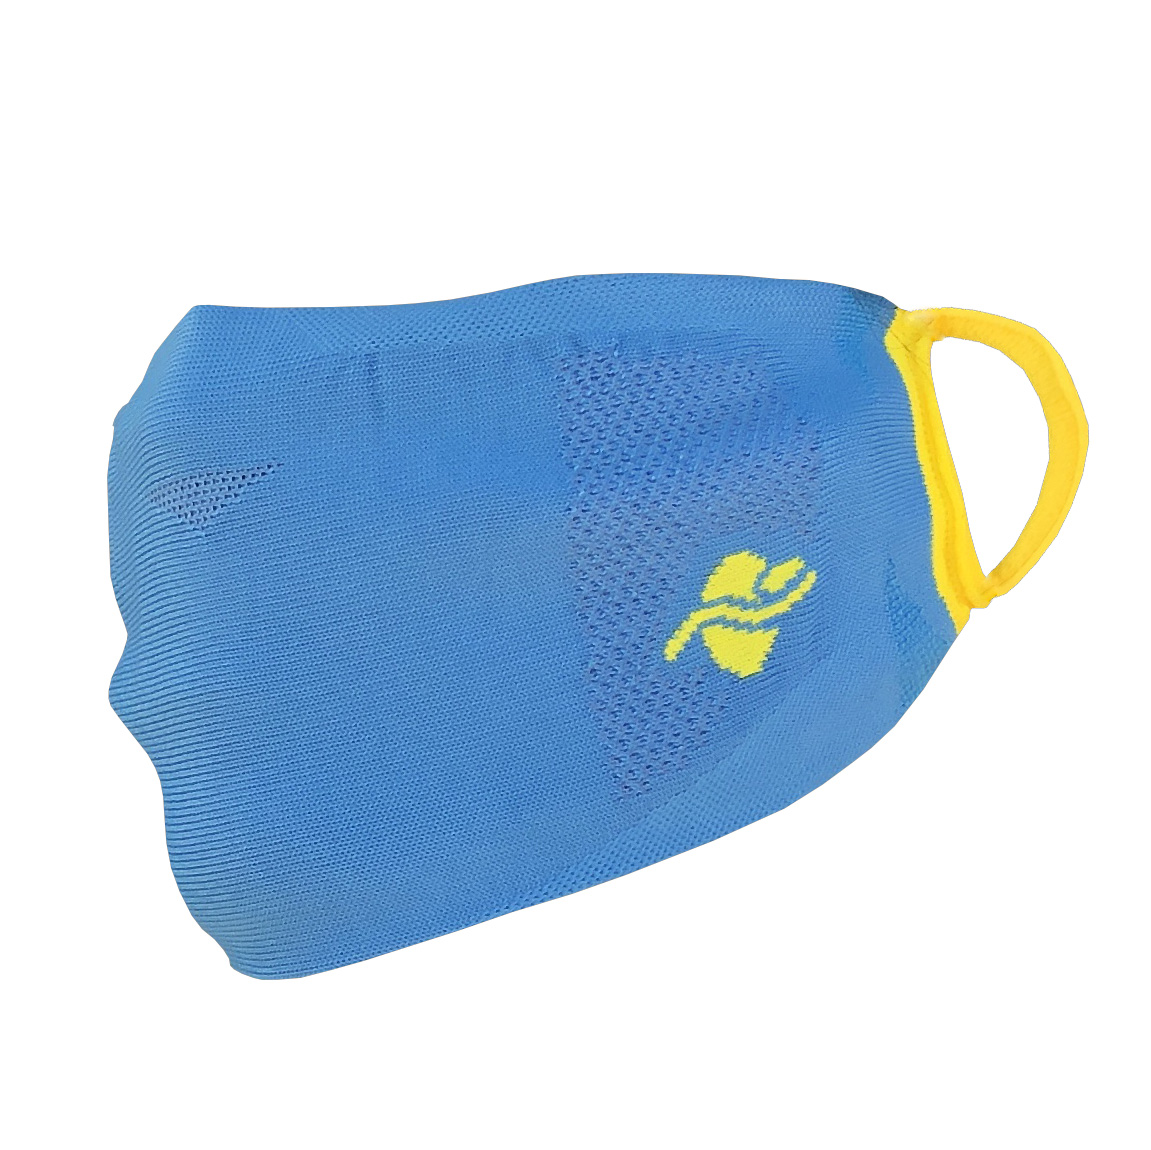 DS スポーツマスク